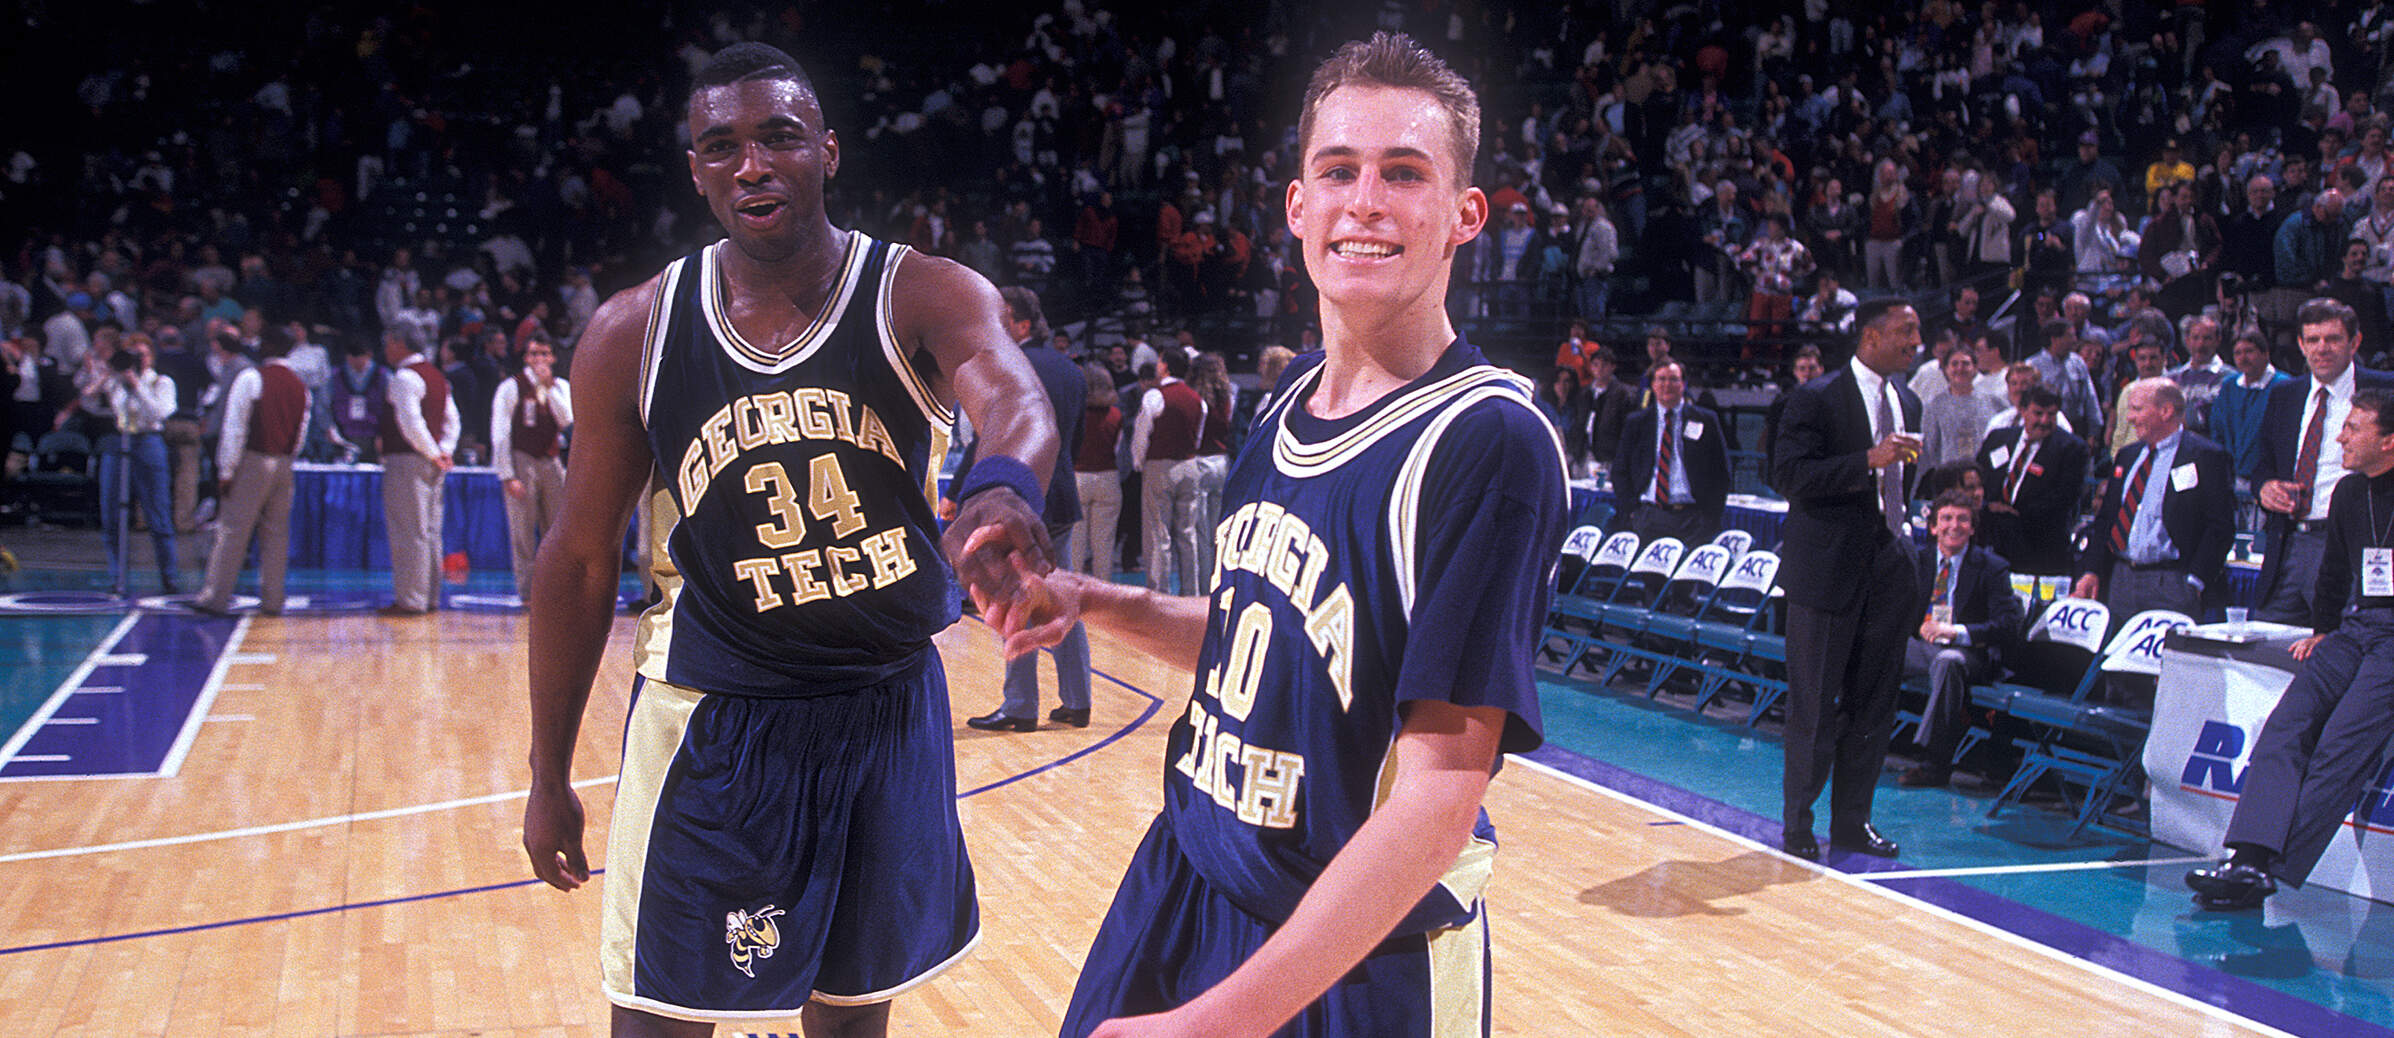 Georgia Tech Basketball: 1993 ACC Champions